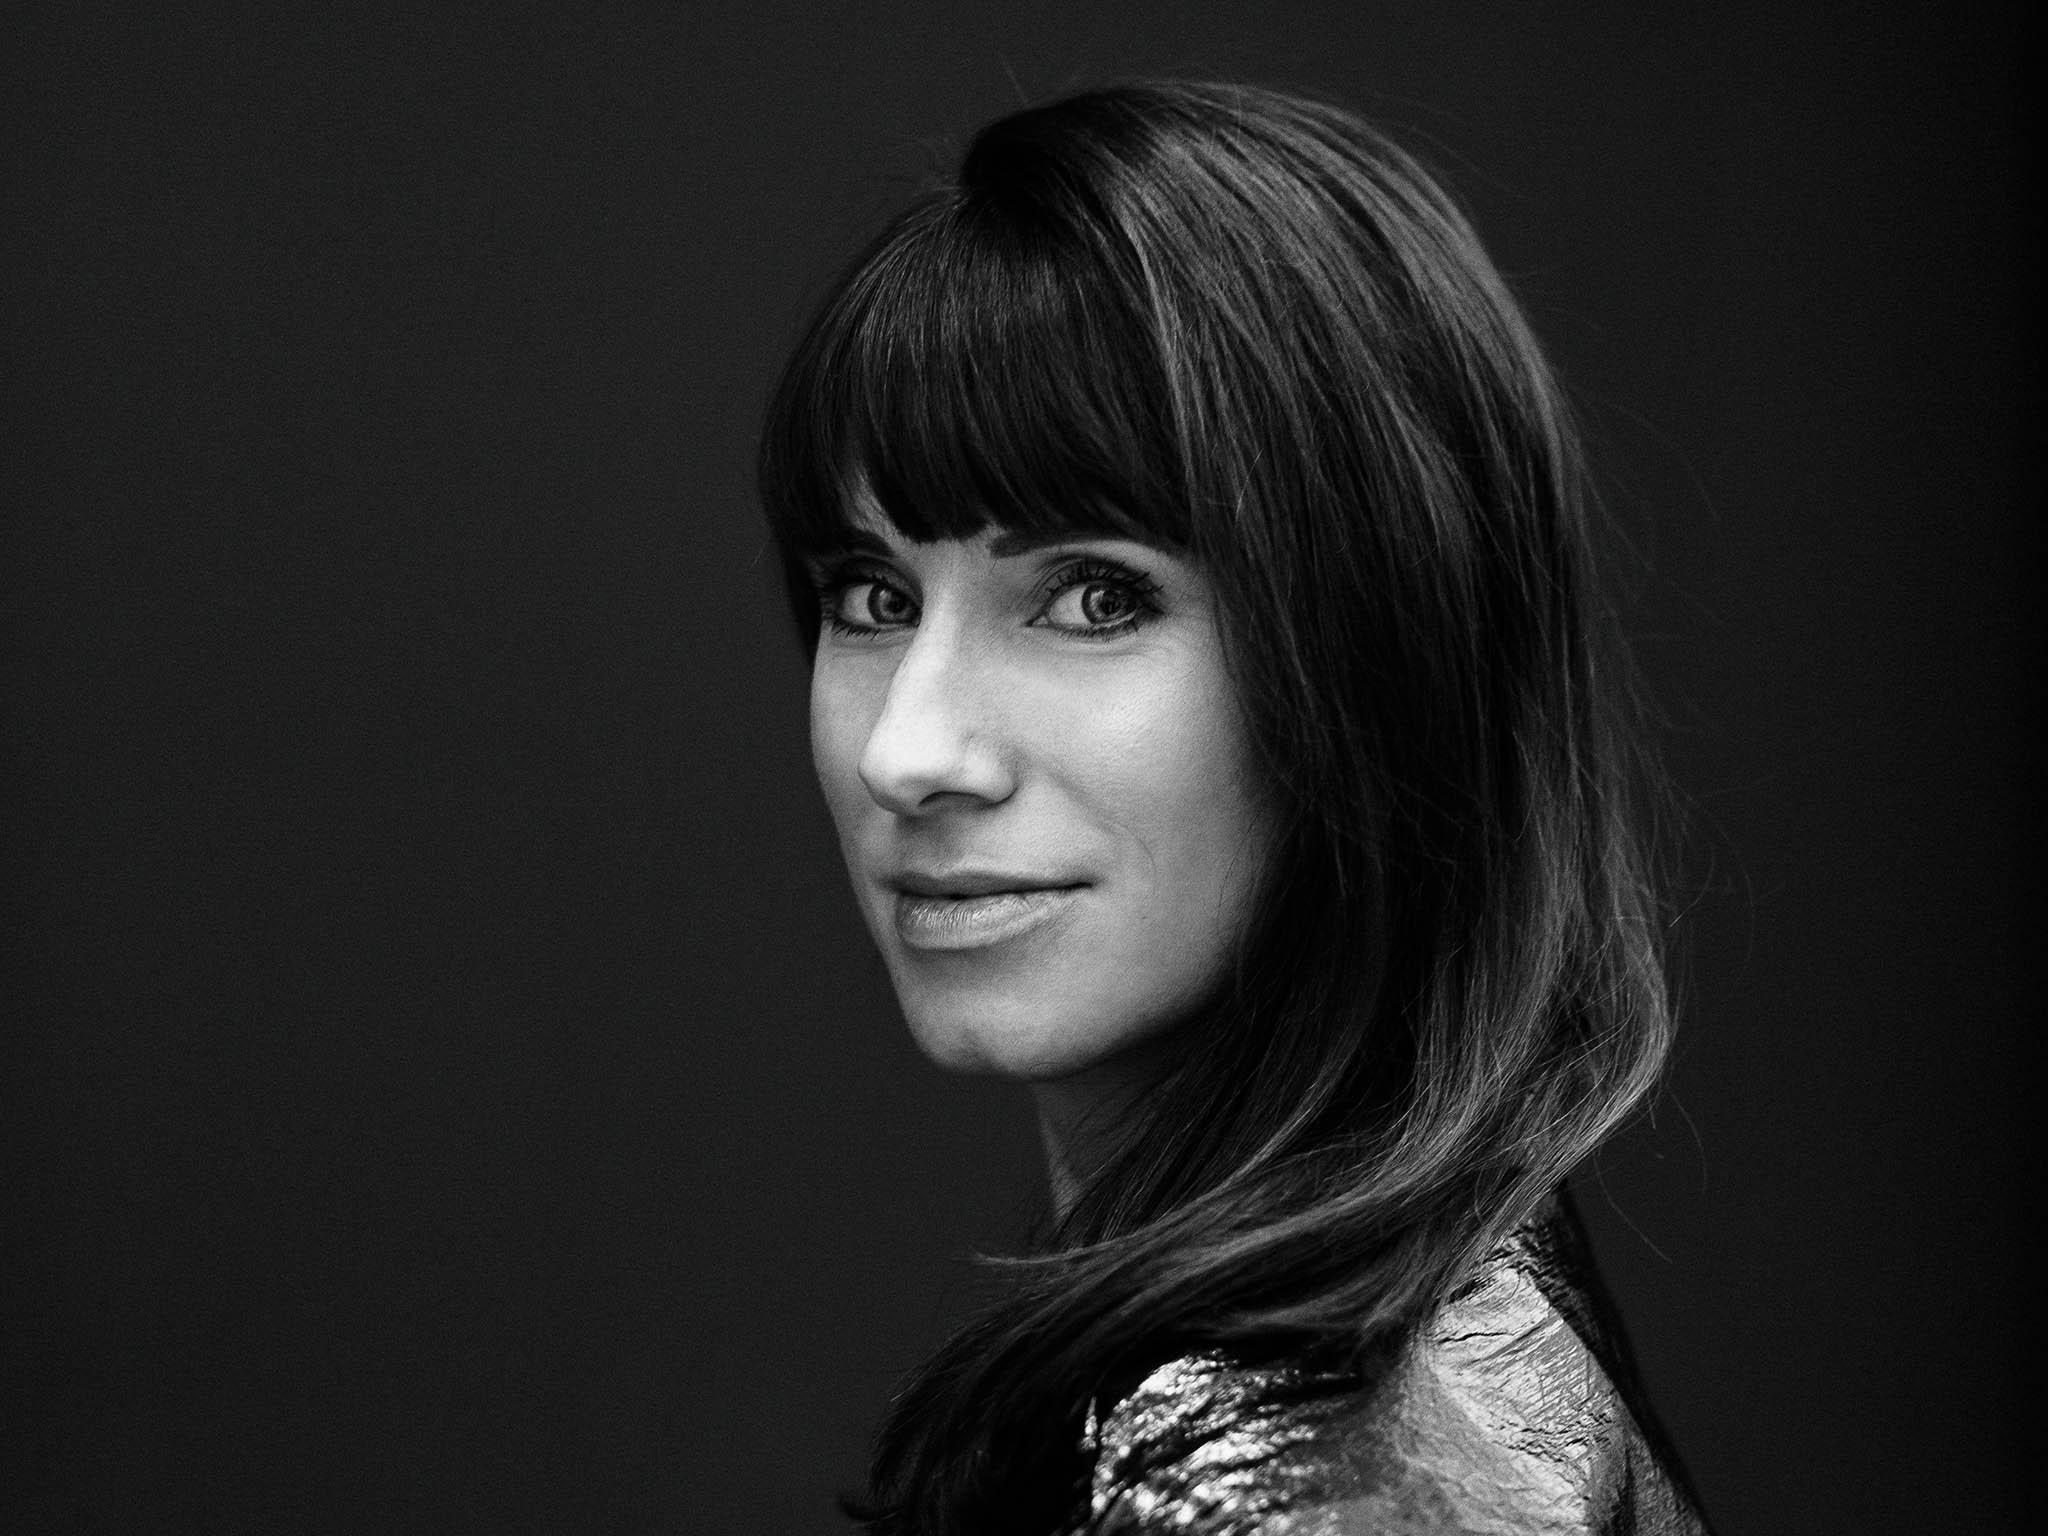 Lucie Koldová, návrhářka, vítězka ceny Designérka roku na Czech Grand Design 2018